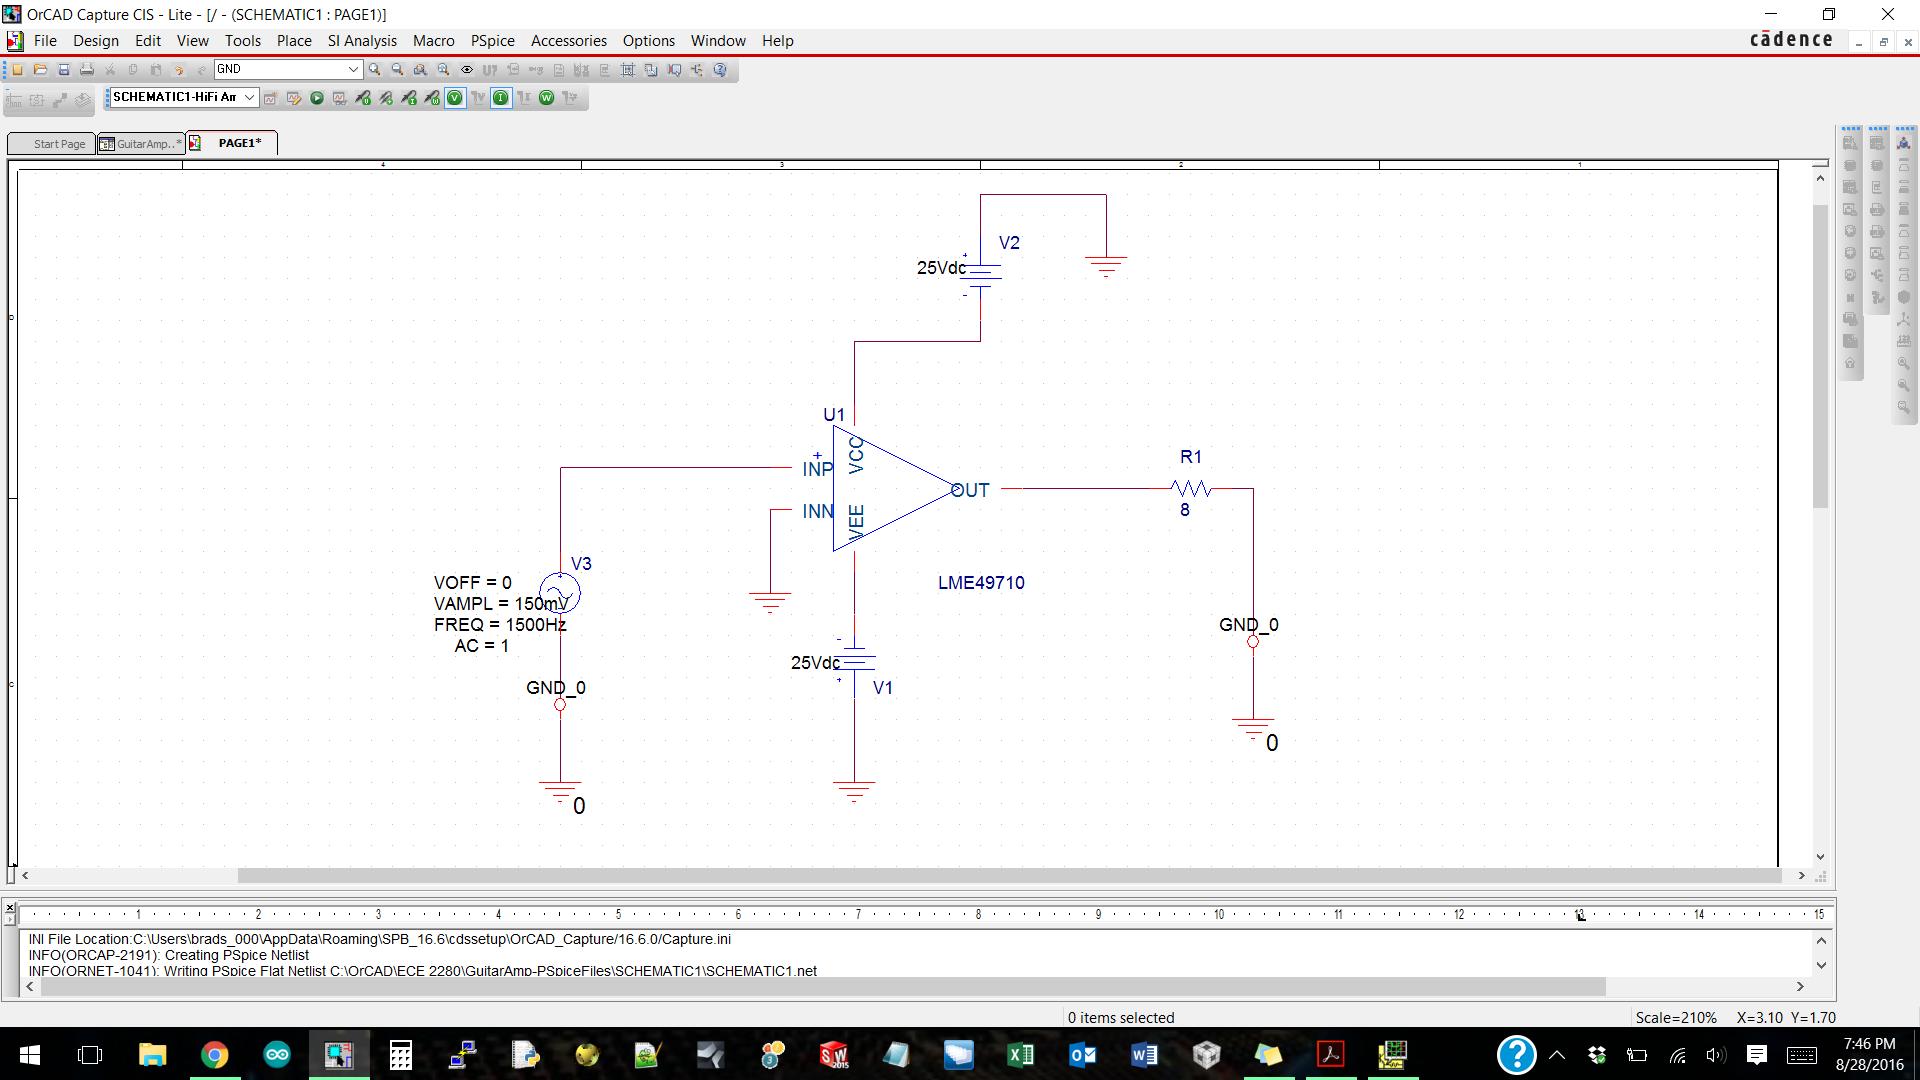 Error Evaluation Version Analog Node Limit 64 Nodes Exceeded